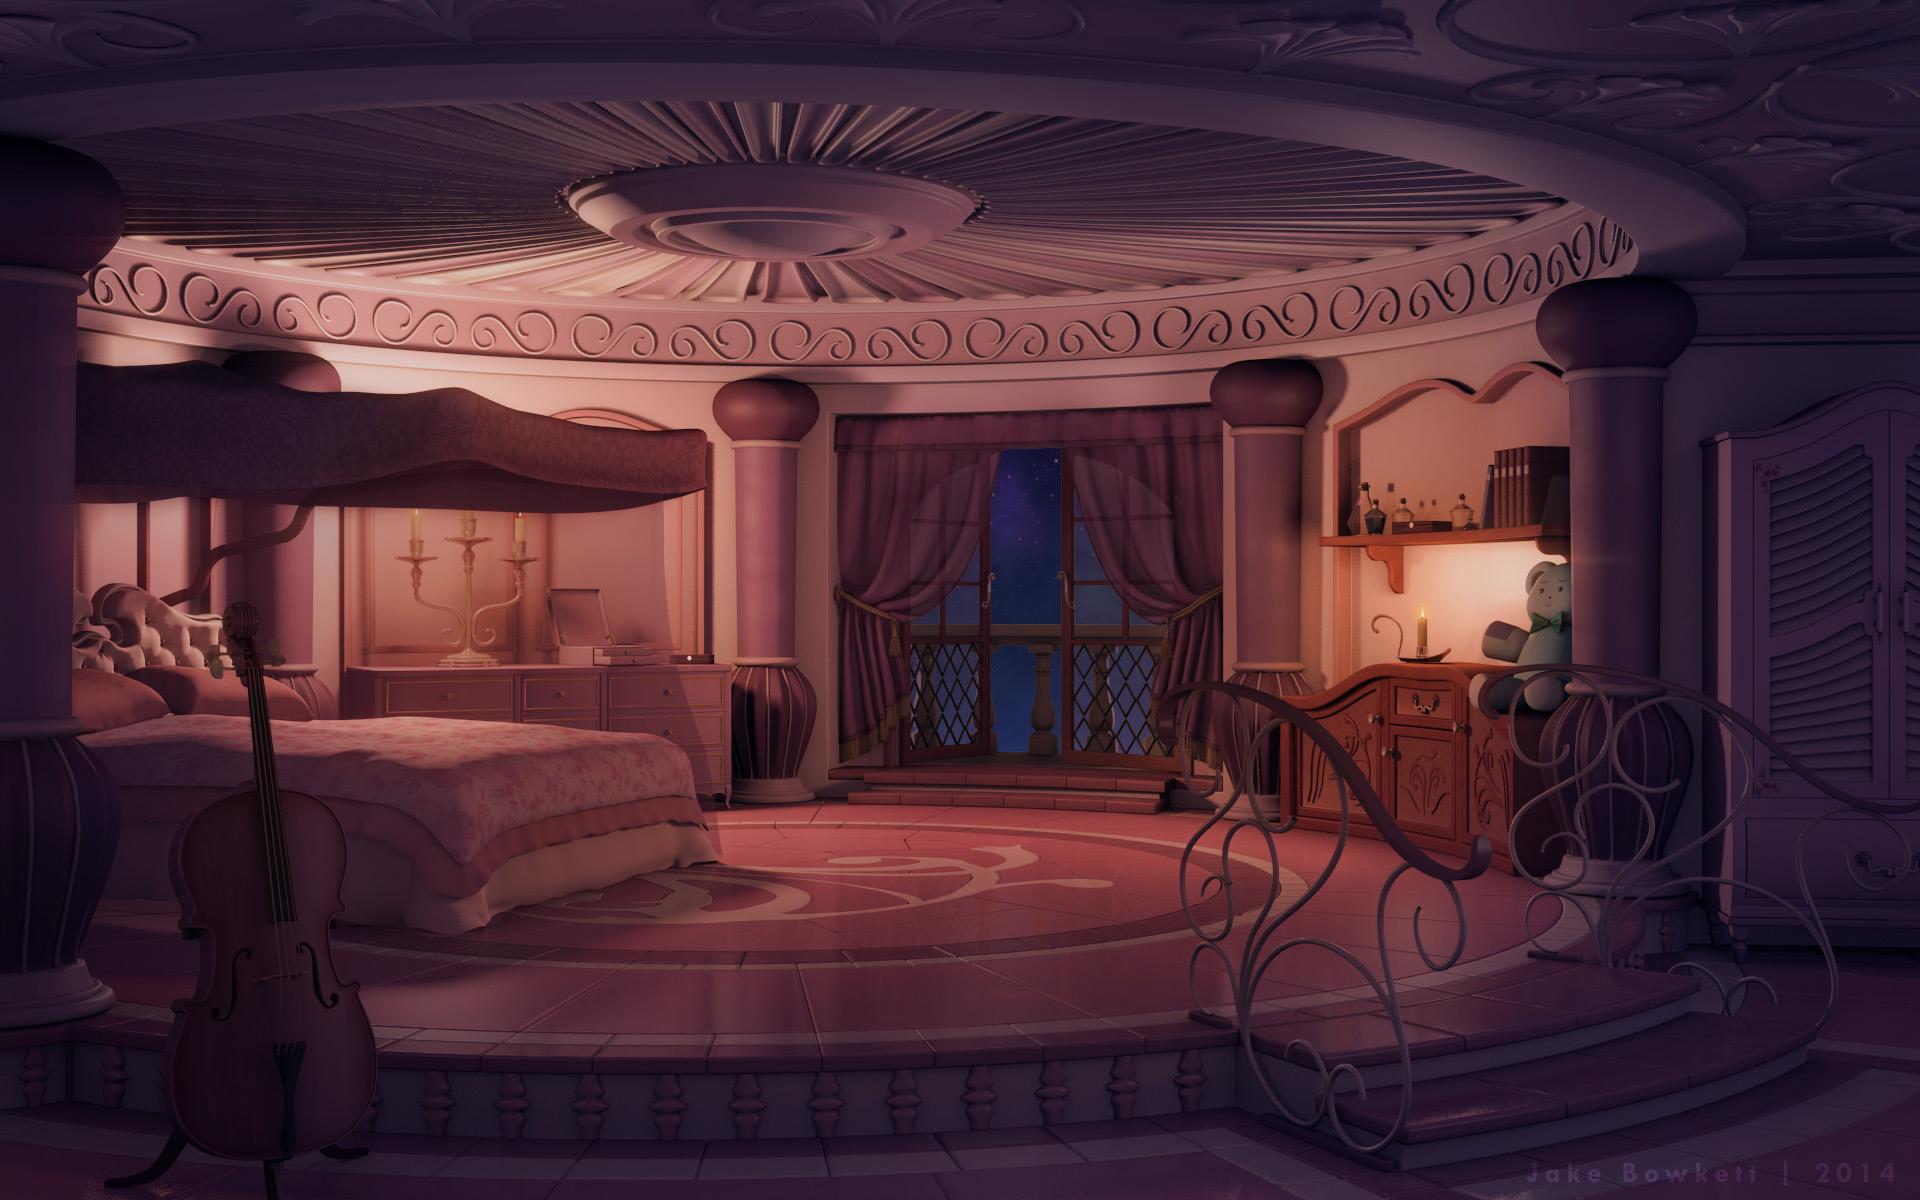 Princess Room Night Final W By Jakebowkett D8pw43i